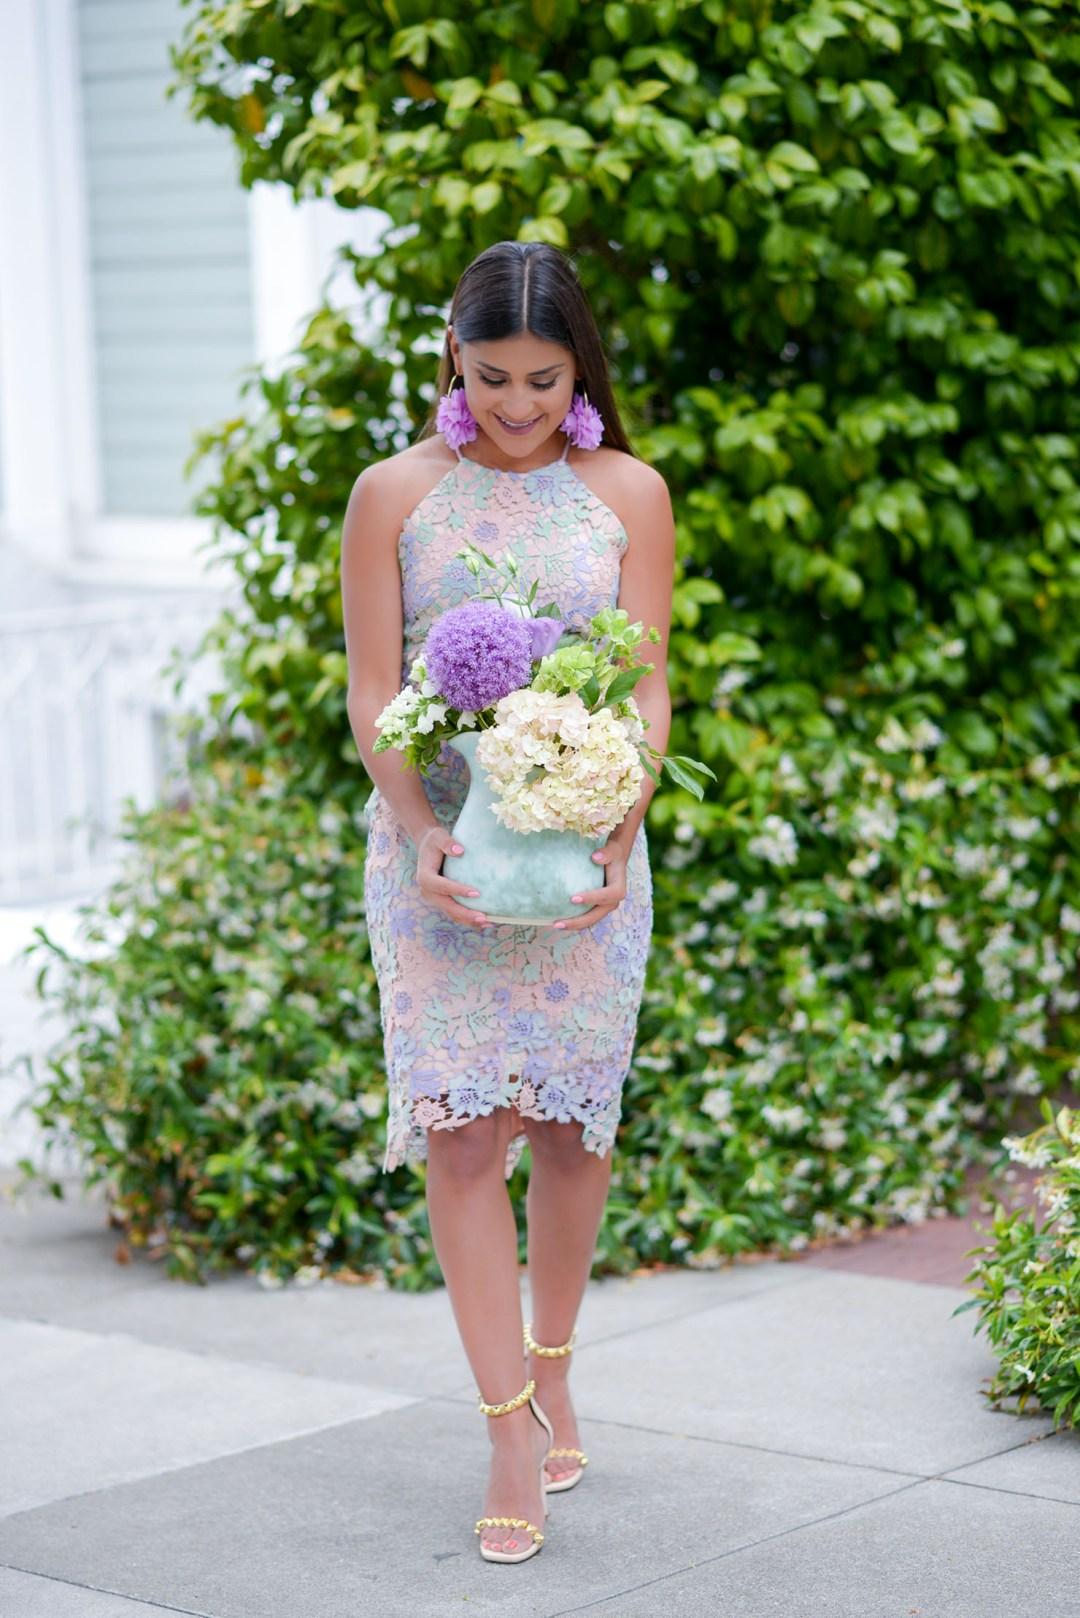 Lifestyle blogger Kelsey Kaplan of Kelsey Kaplan Fashion wearing Adelyn Rae Lace Floral wedding guest dress and Stuart Weitzman sandals